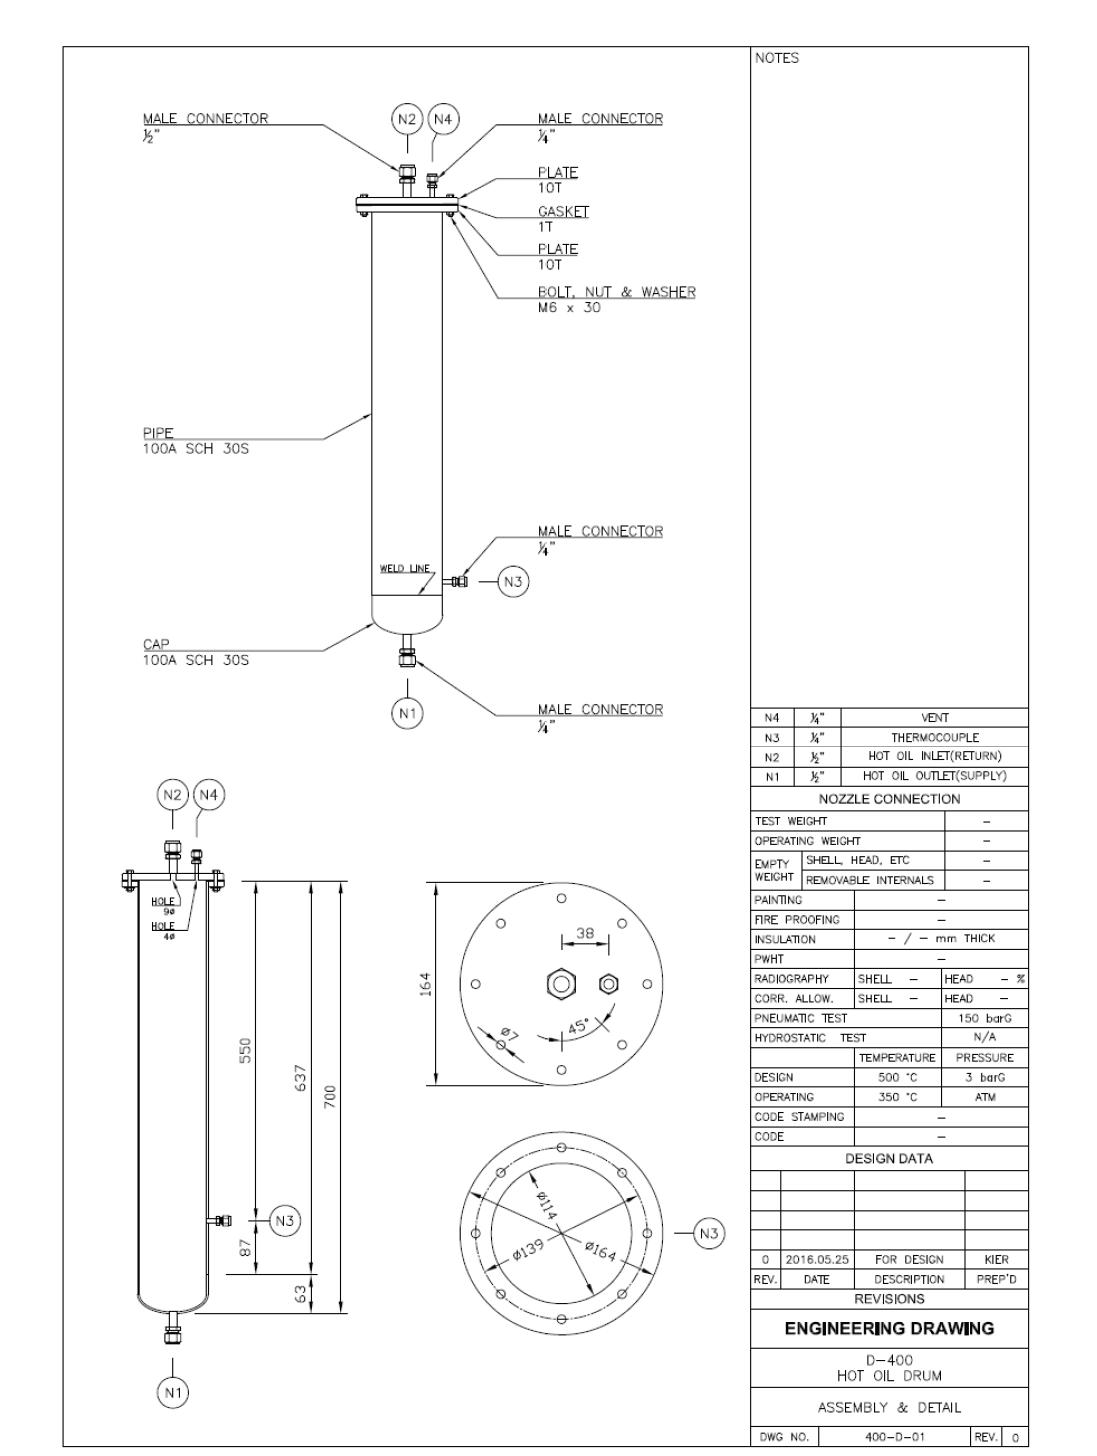 D-400 Hot Oil Drum 제작 도면 (Assembly & Detail)